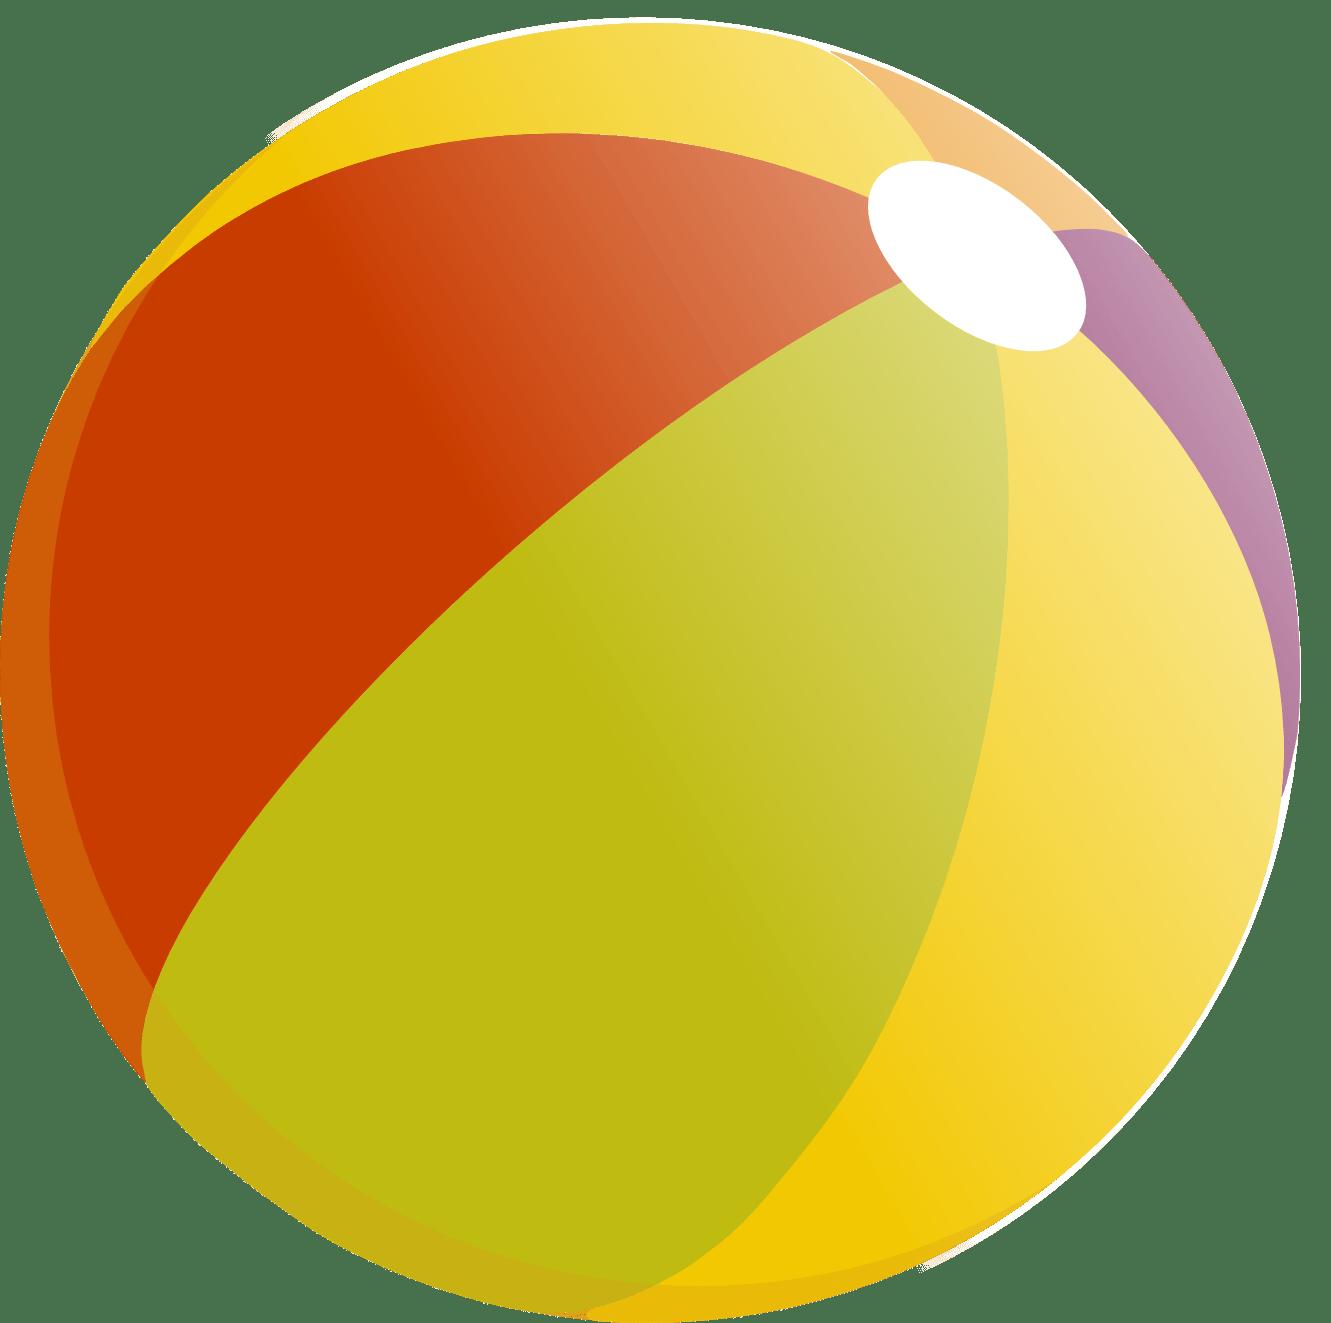 hight resolution of beach ball clip art image 18132